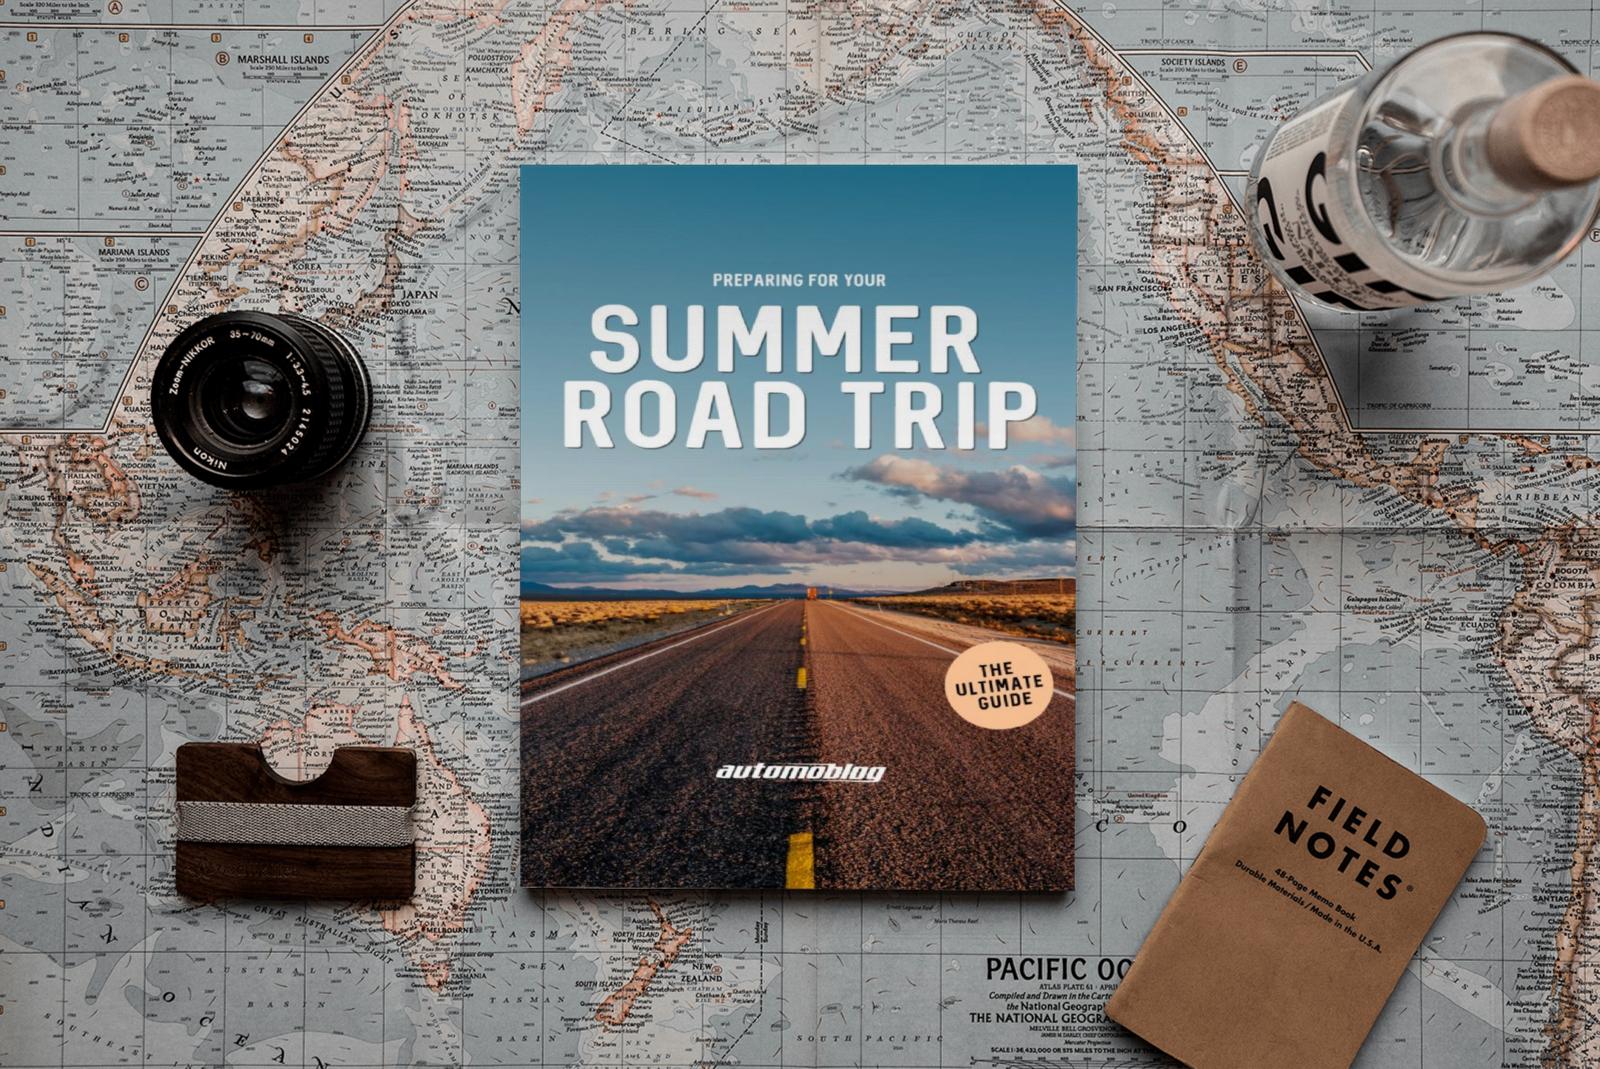 Summer Road Trip book & map